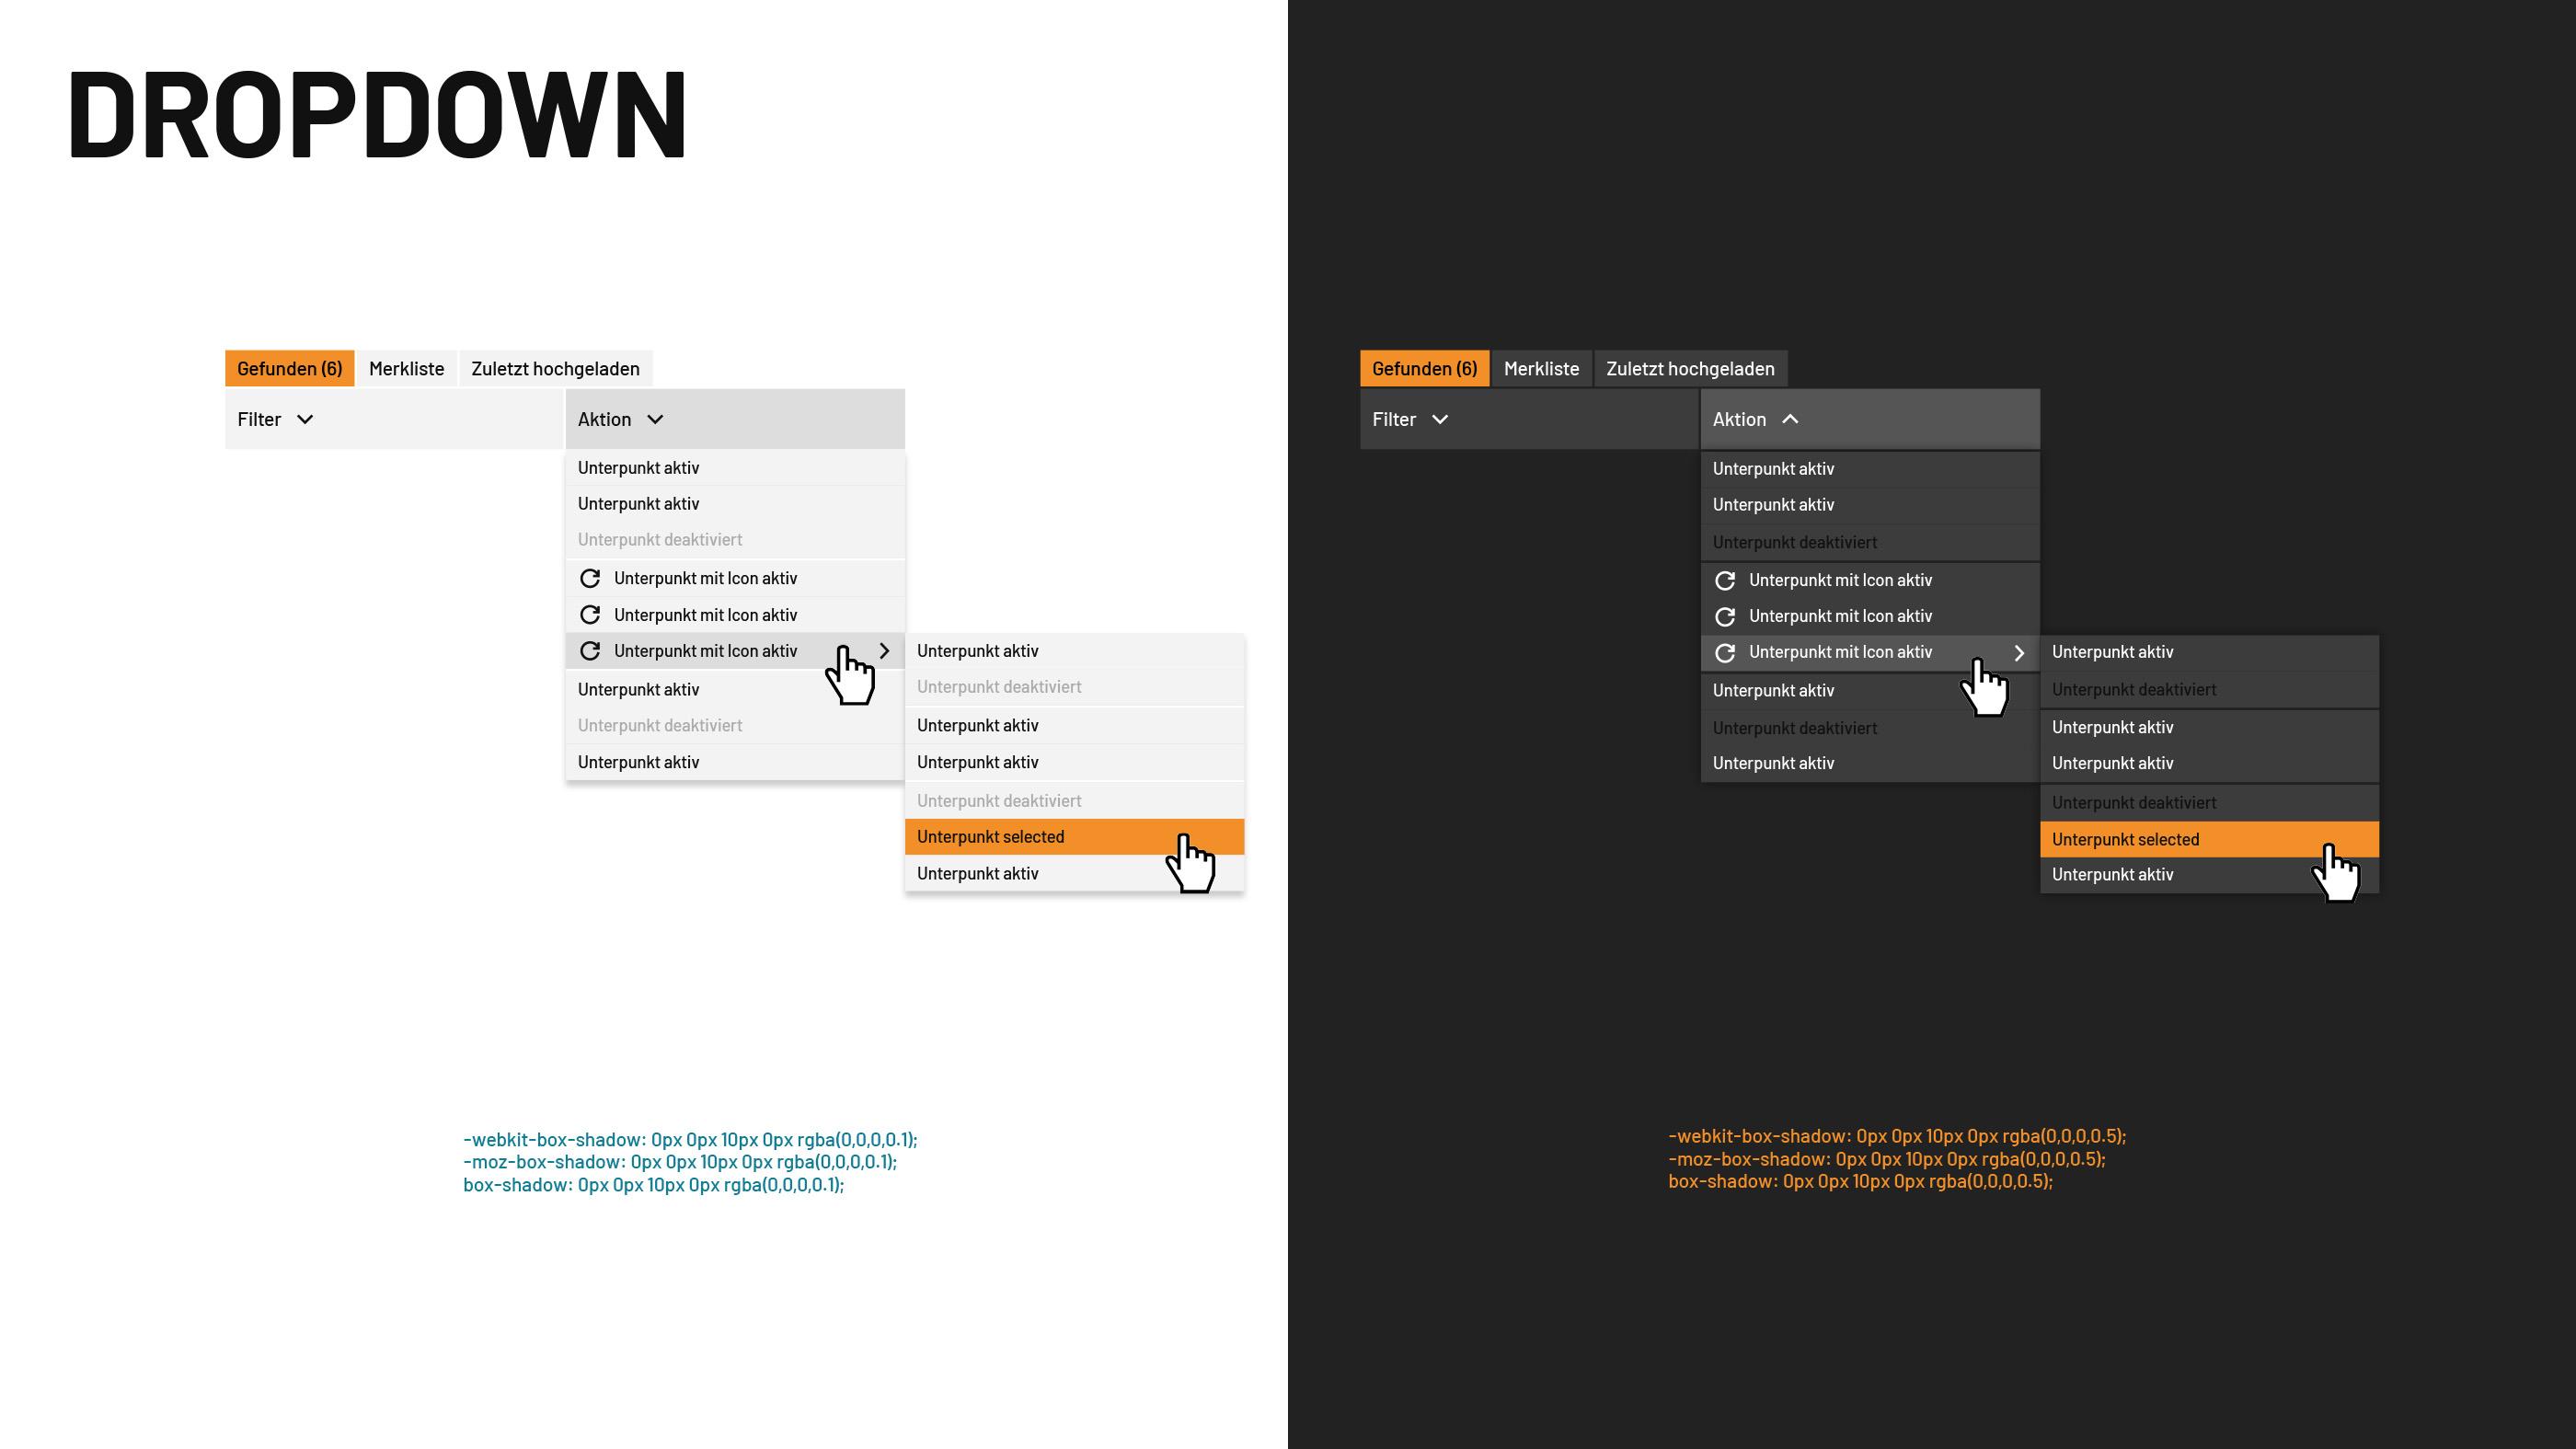 Detailausschnitt des GUI des Media Asset Management Systems von SixOMC